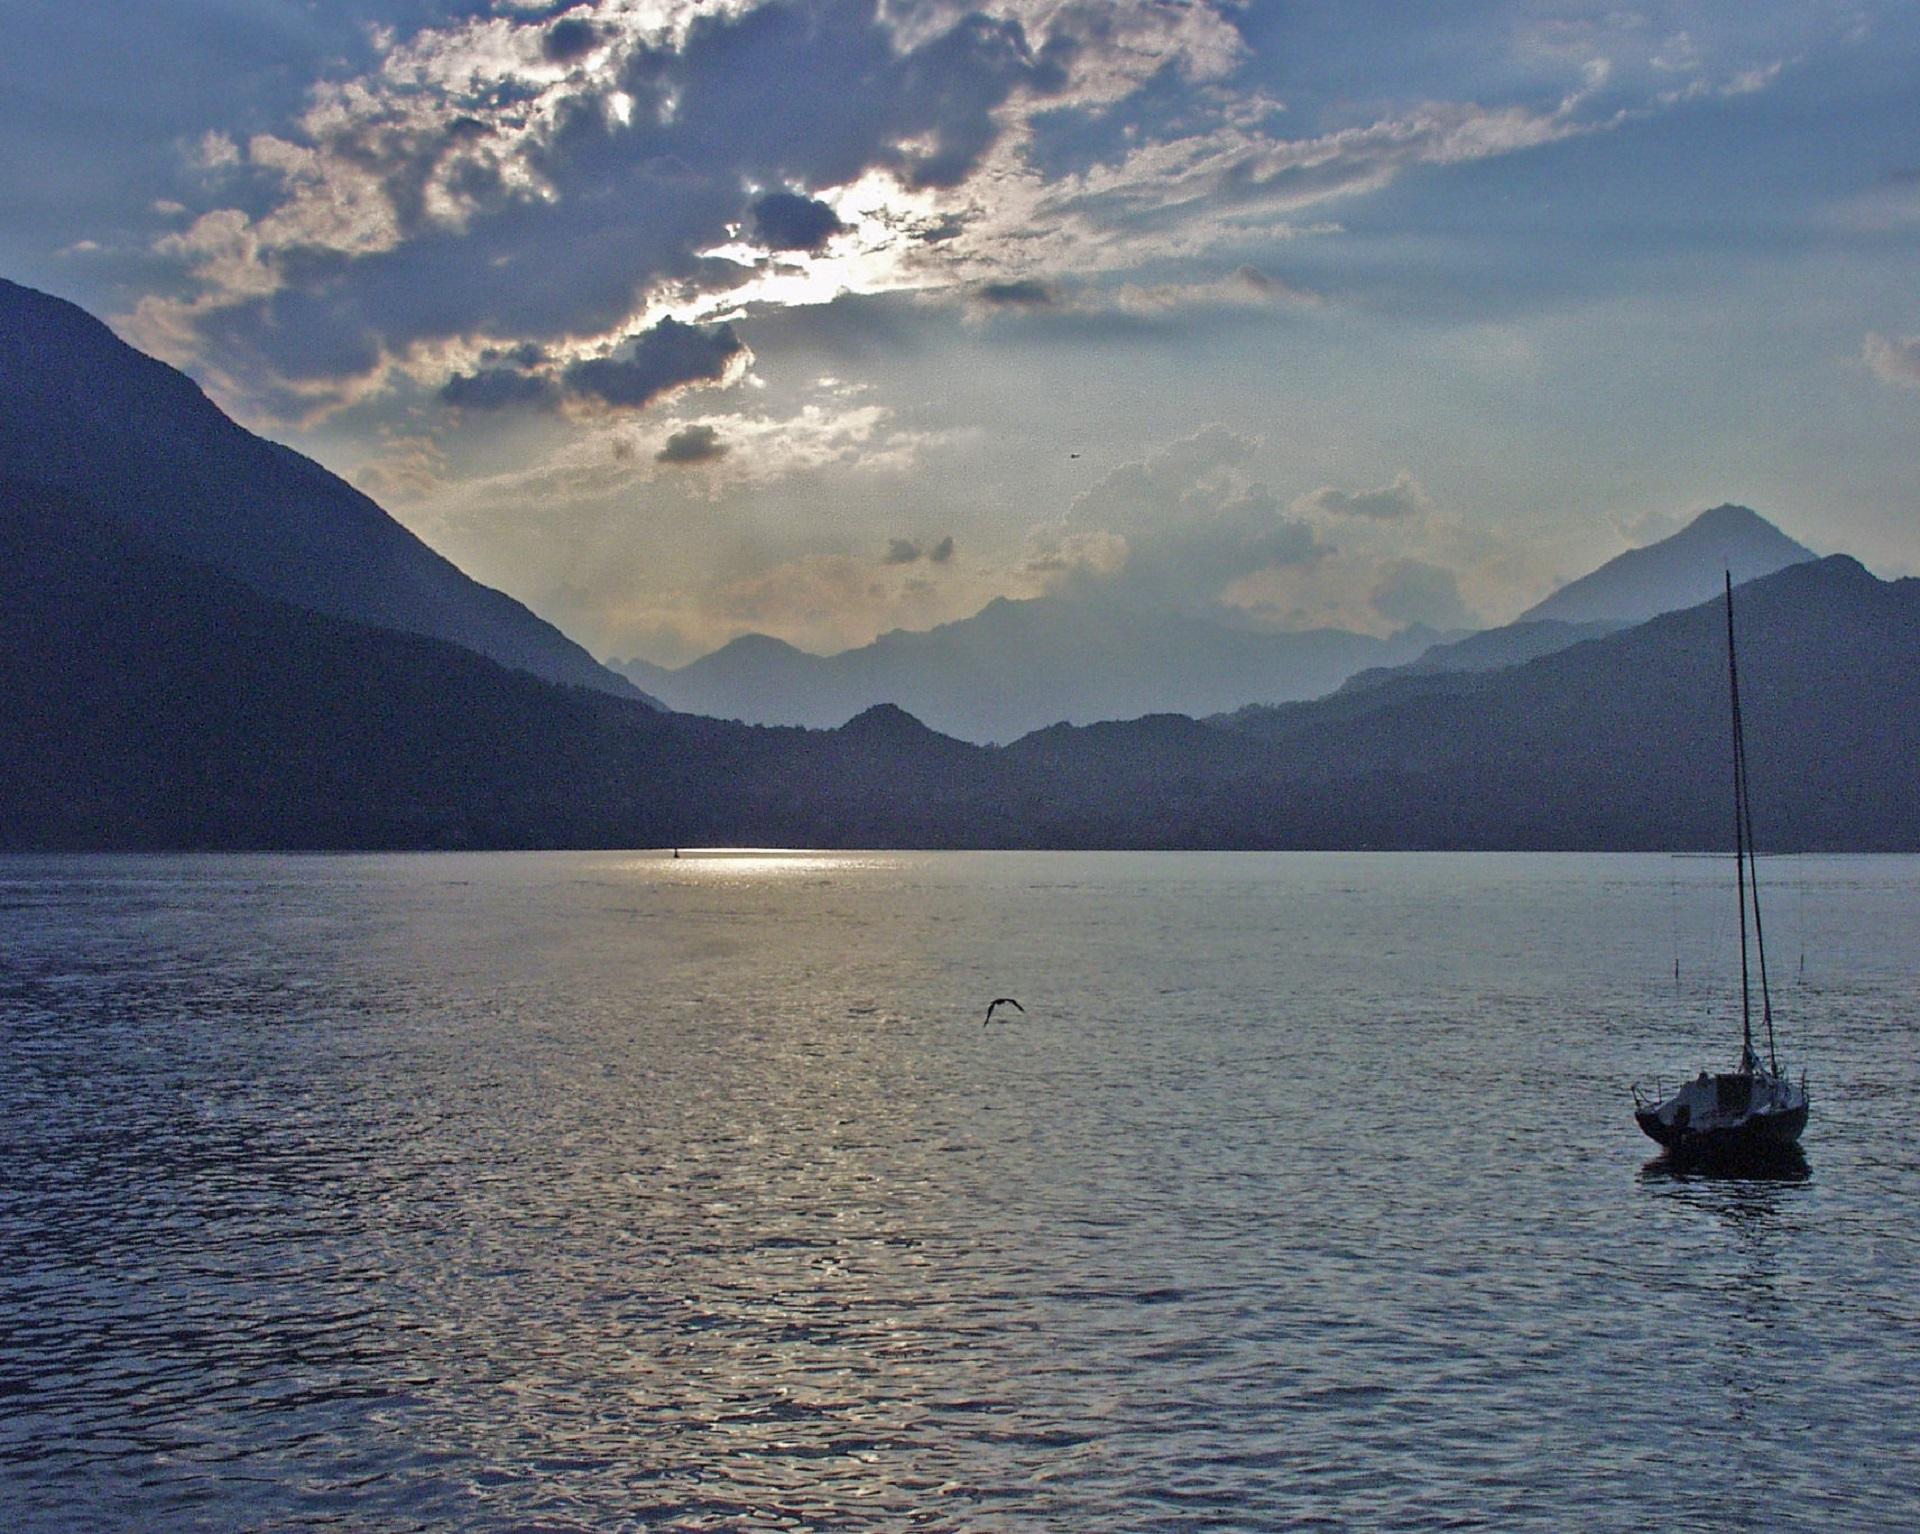 солнце в горах озеро яхты картинки персоналу без претензий